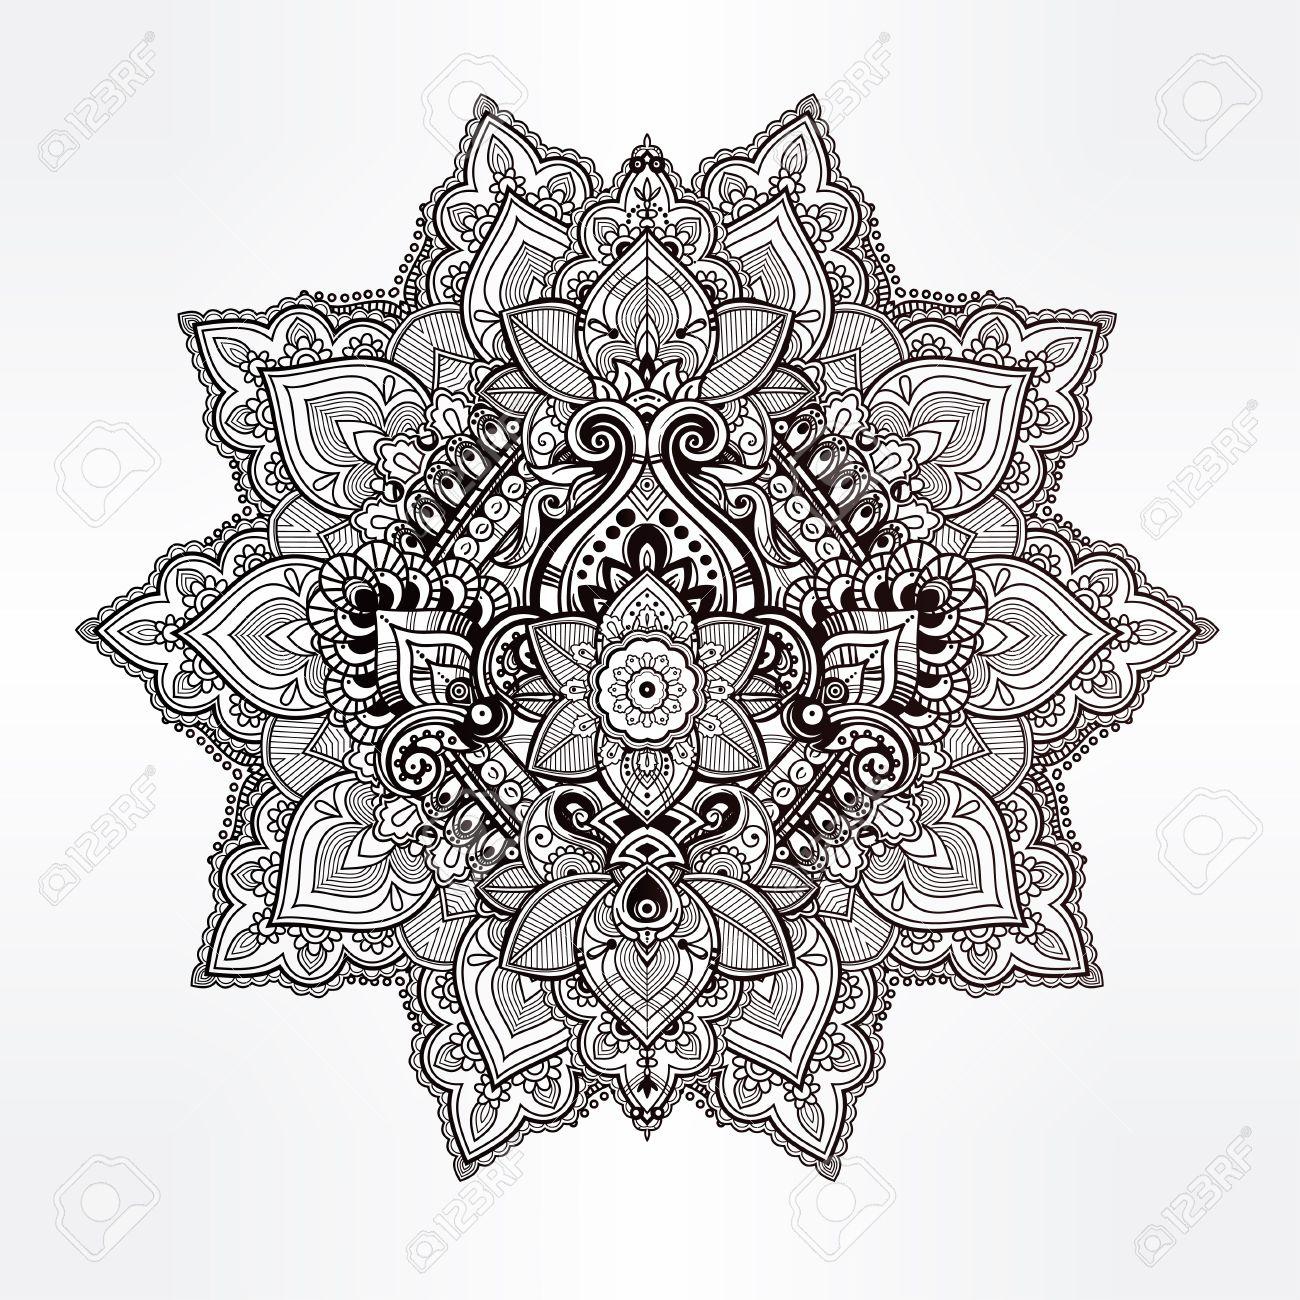 Luxury Fleur De Lotus Mandala Image - Printable Coloring Pages ...